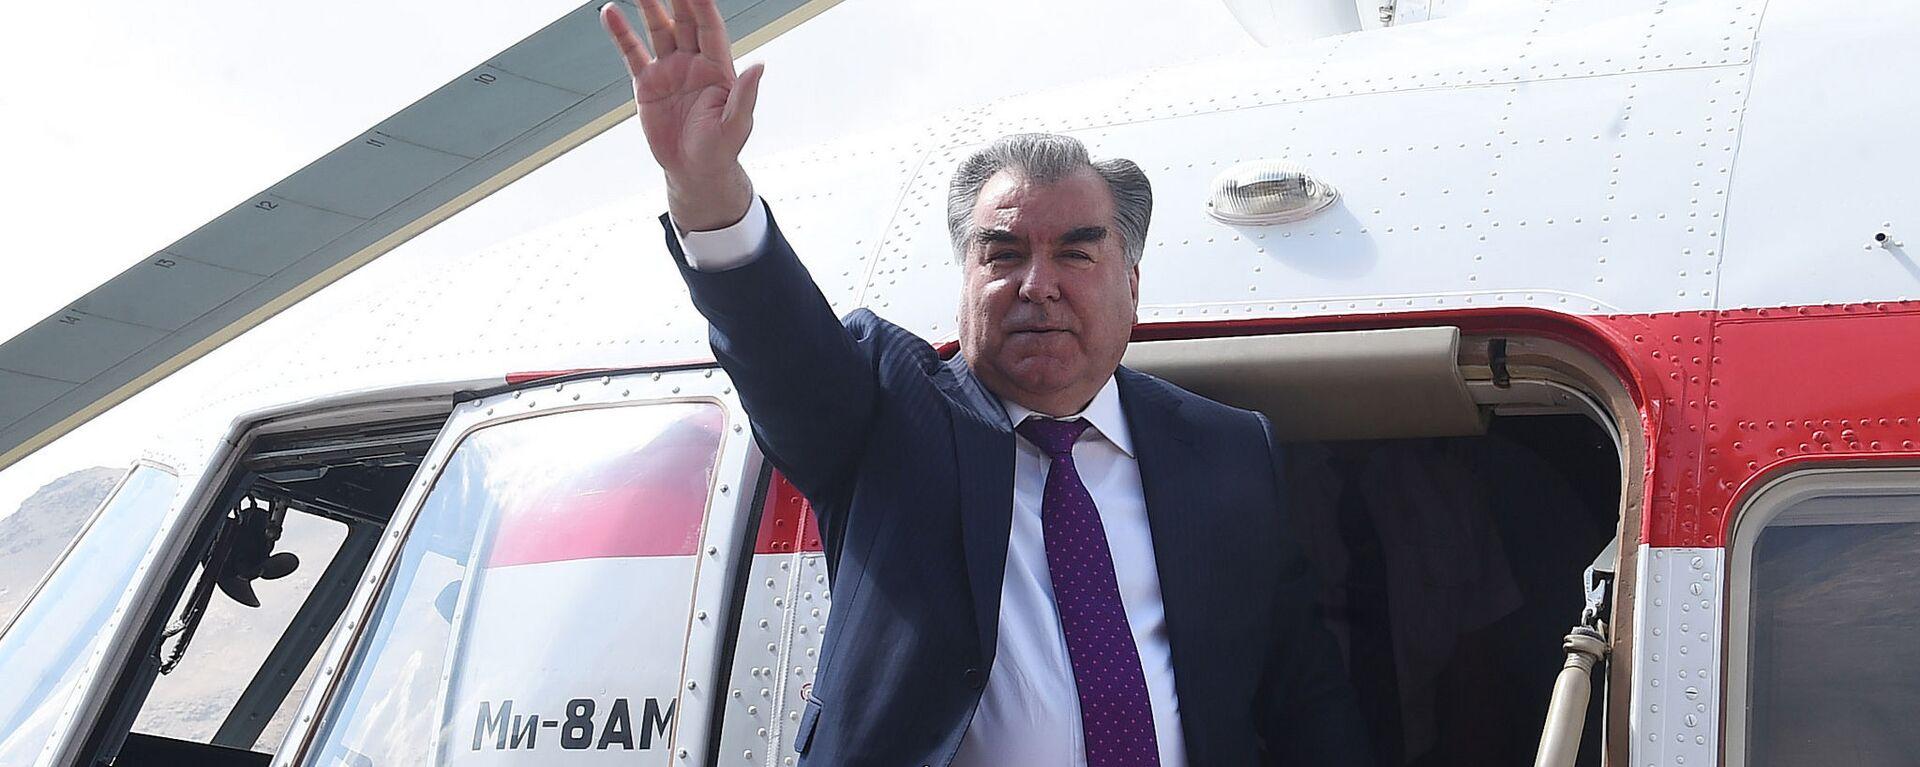 Президент Таджикистана Эмомали Рахмон, архивное фото - Sputnik Тоҷикистон, 1920, 23.09.2021